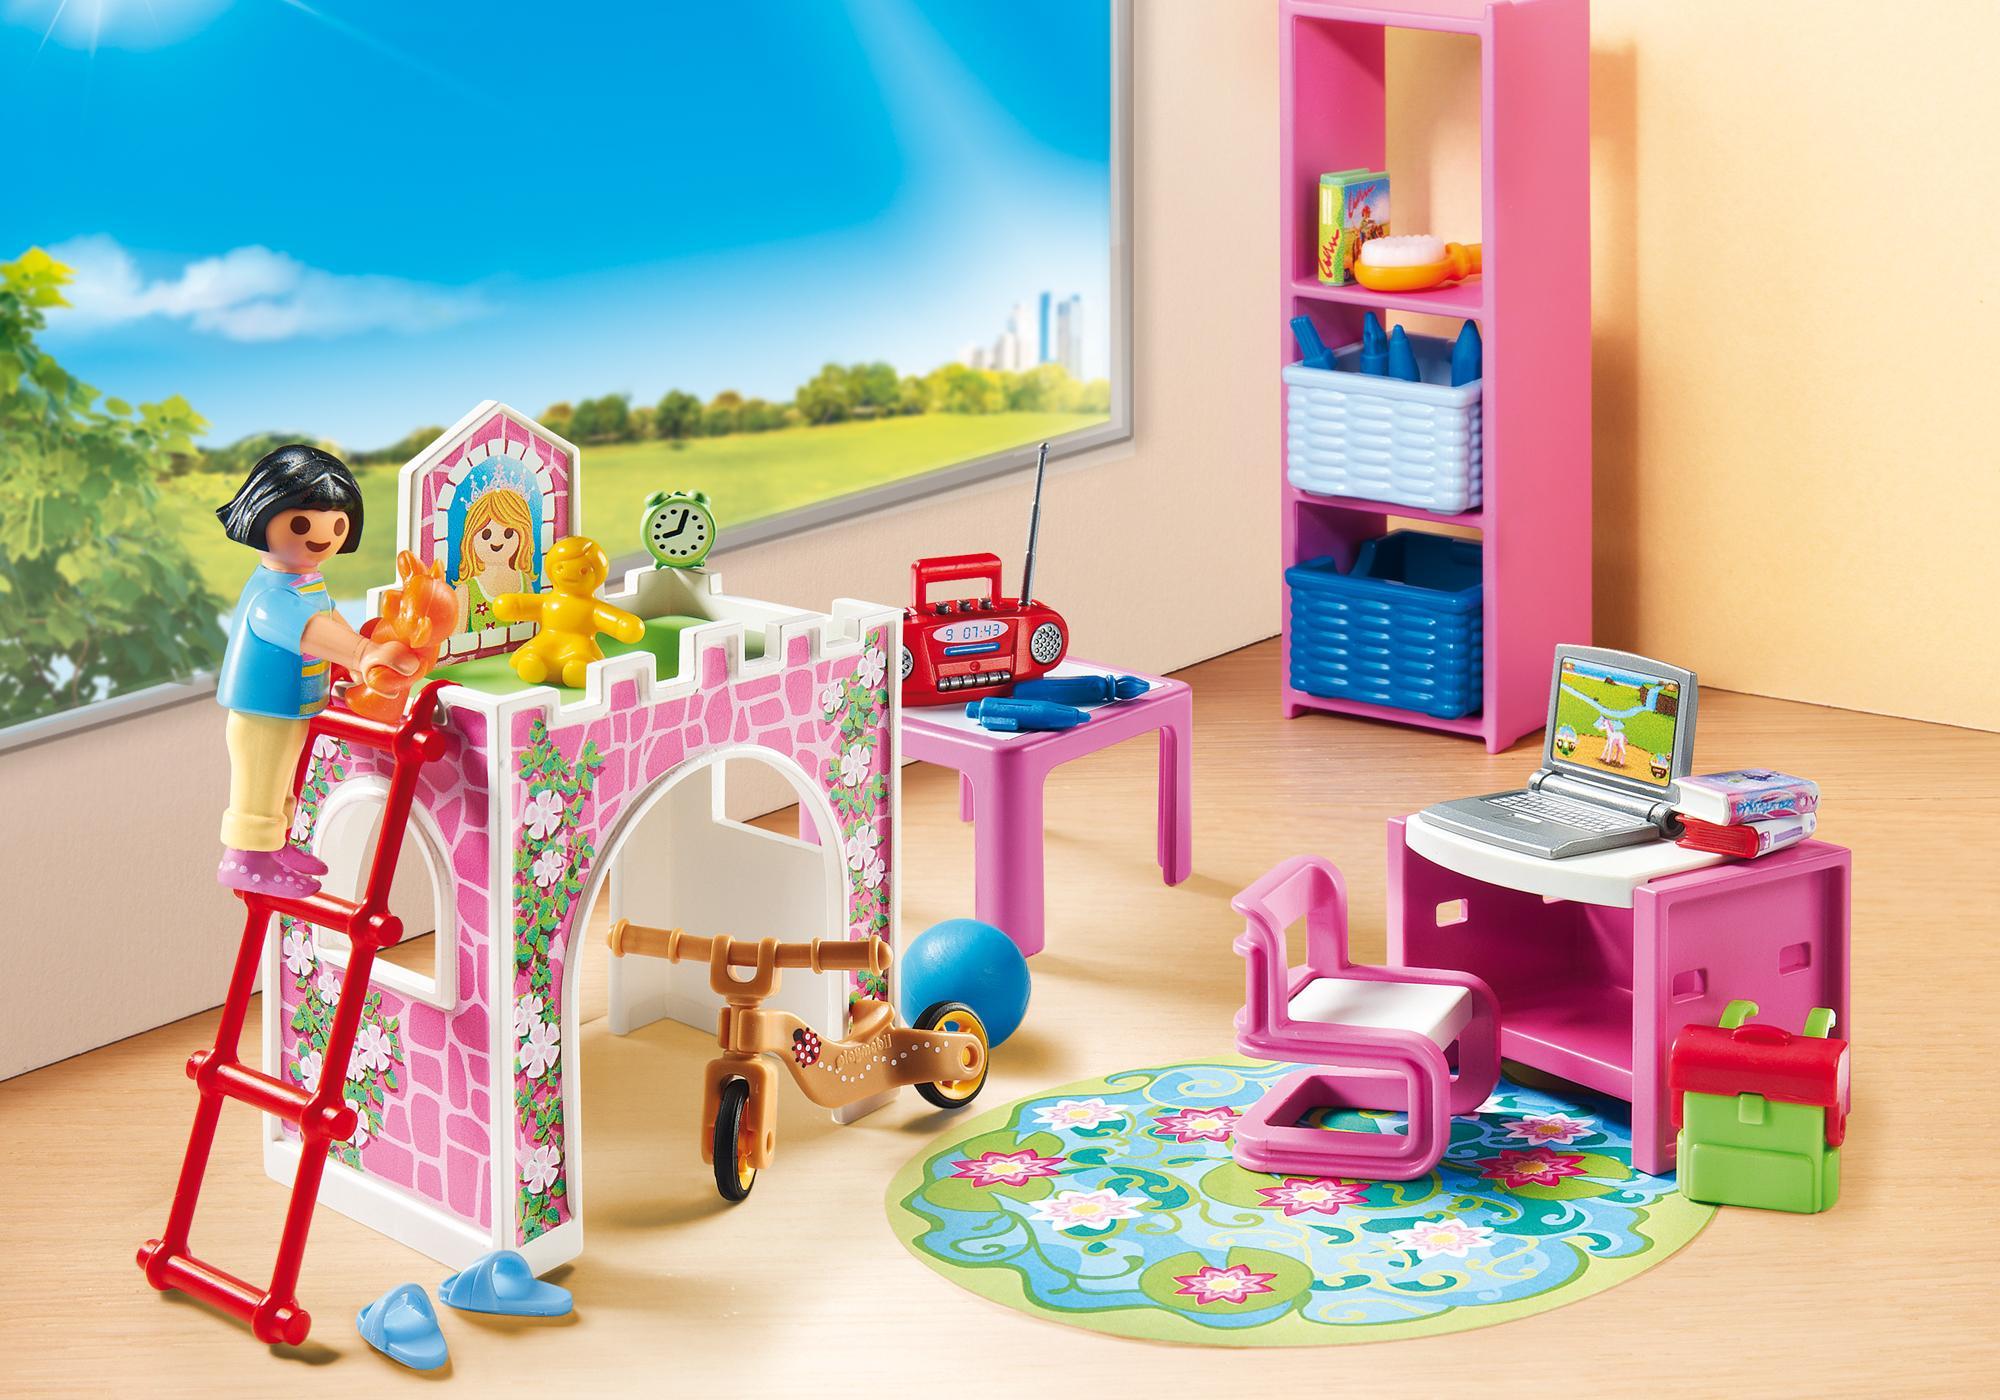 http://media.playmobil.com/i/playmobil/9270_product_detail/Kinderkamer met hoogslaper